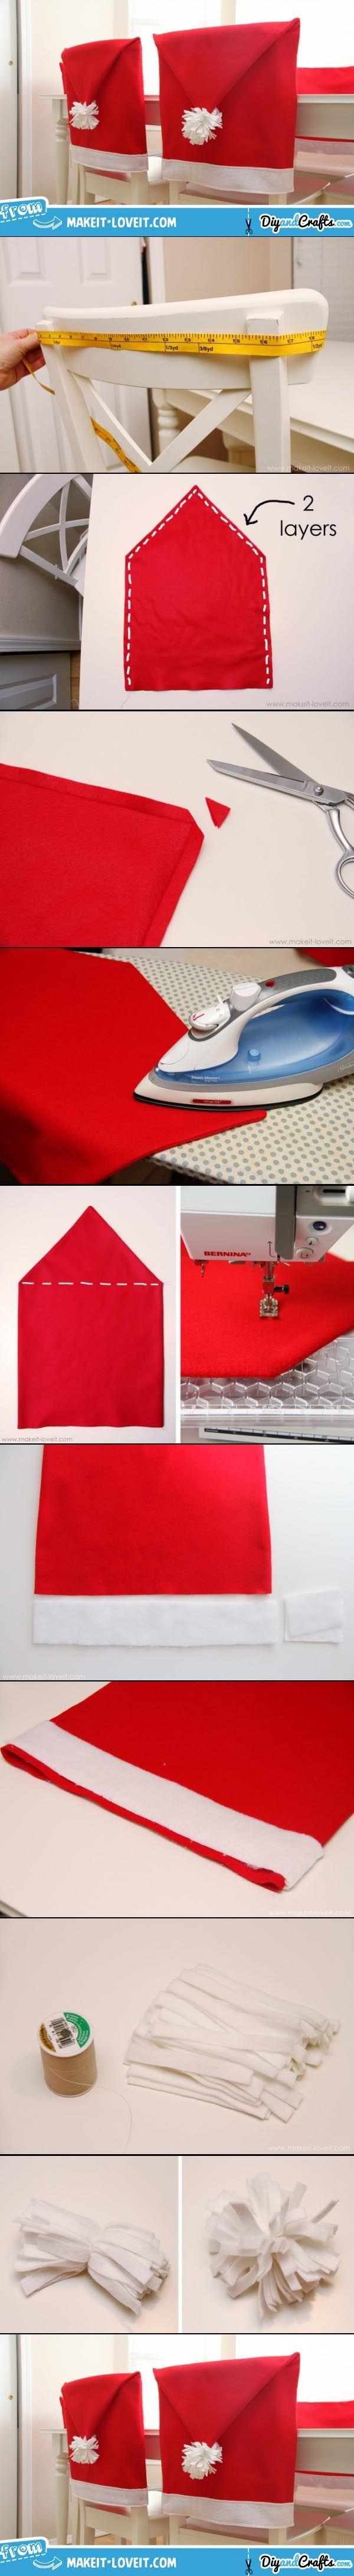 Santa Hat Chair Covers | DIY | diyfunidea.com